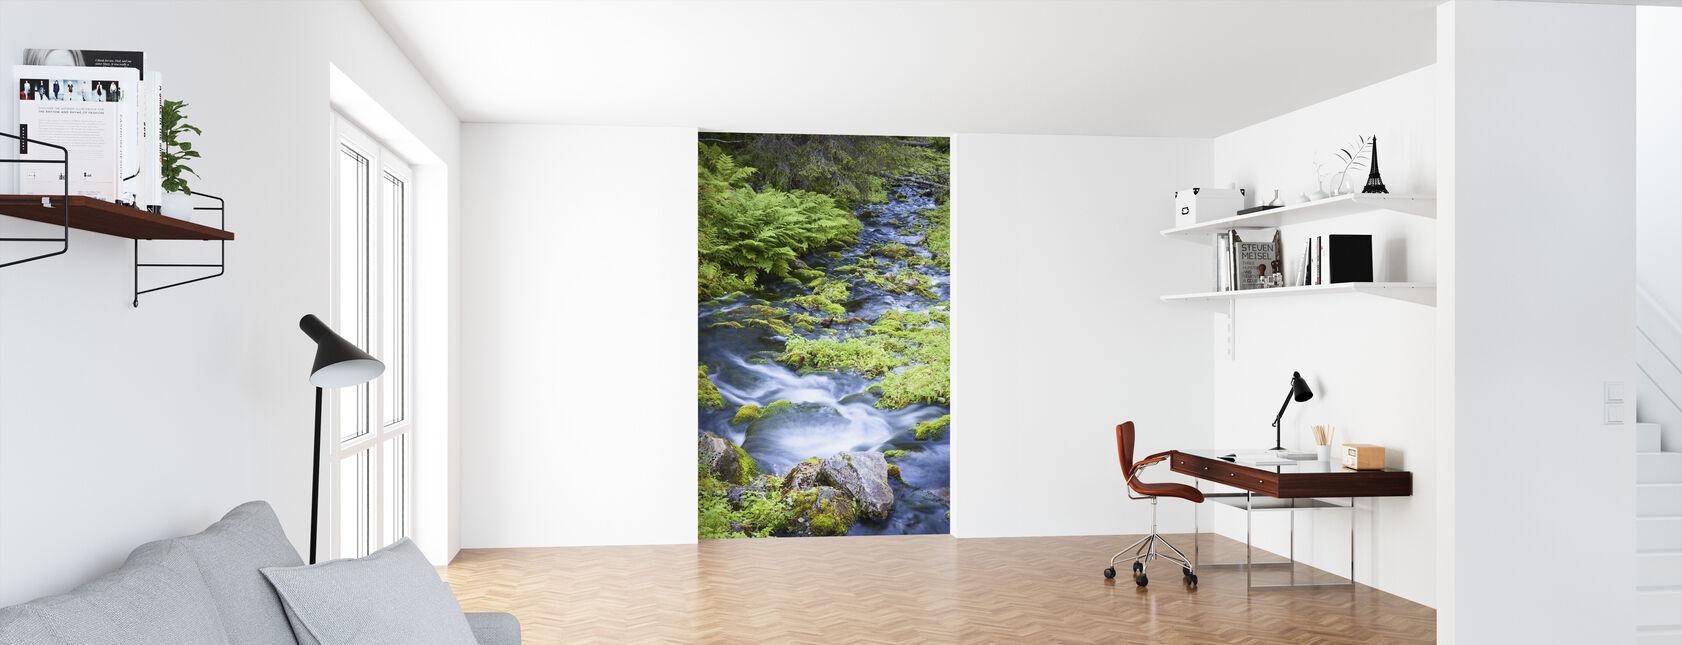 Finnish Brook - Wallpaper - Office